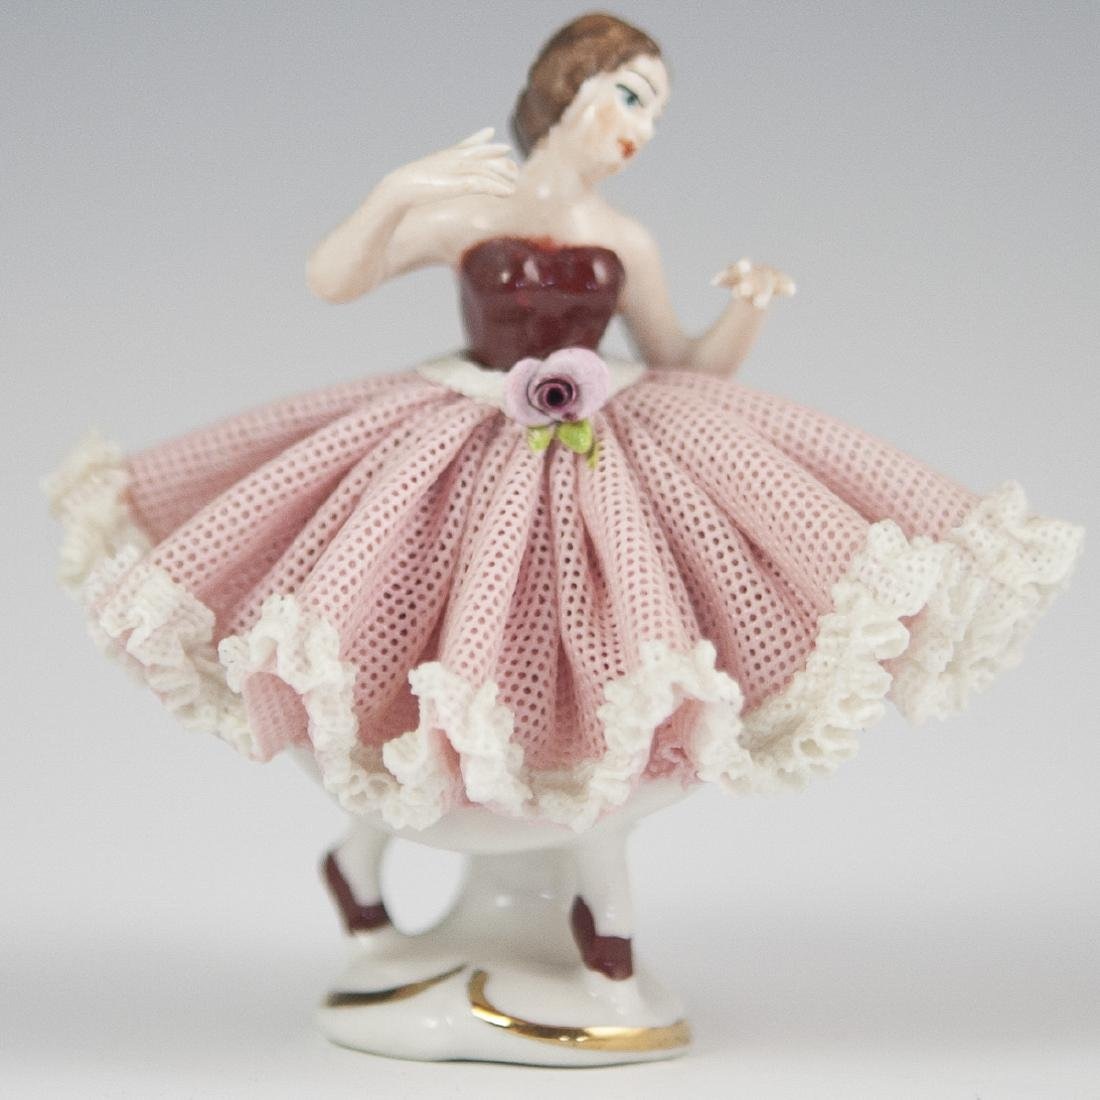 Wilhelm Rittirsch Porcelain Ballerina